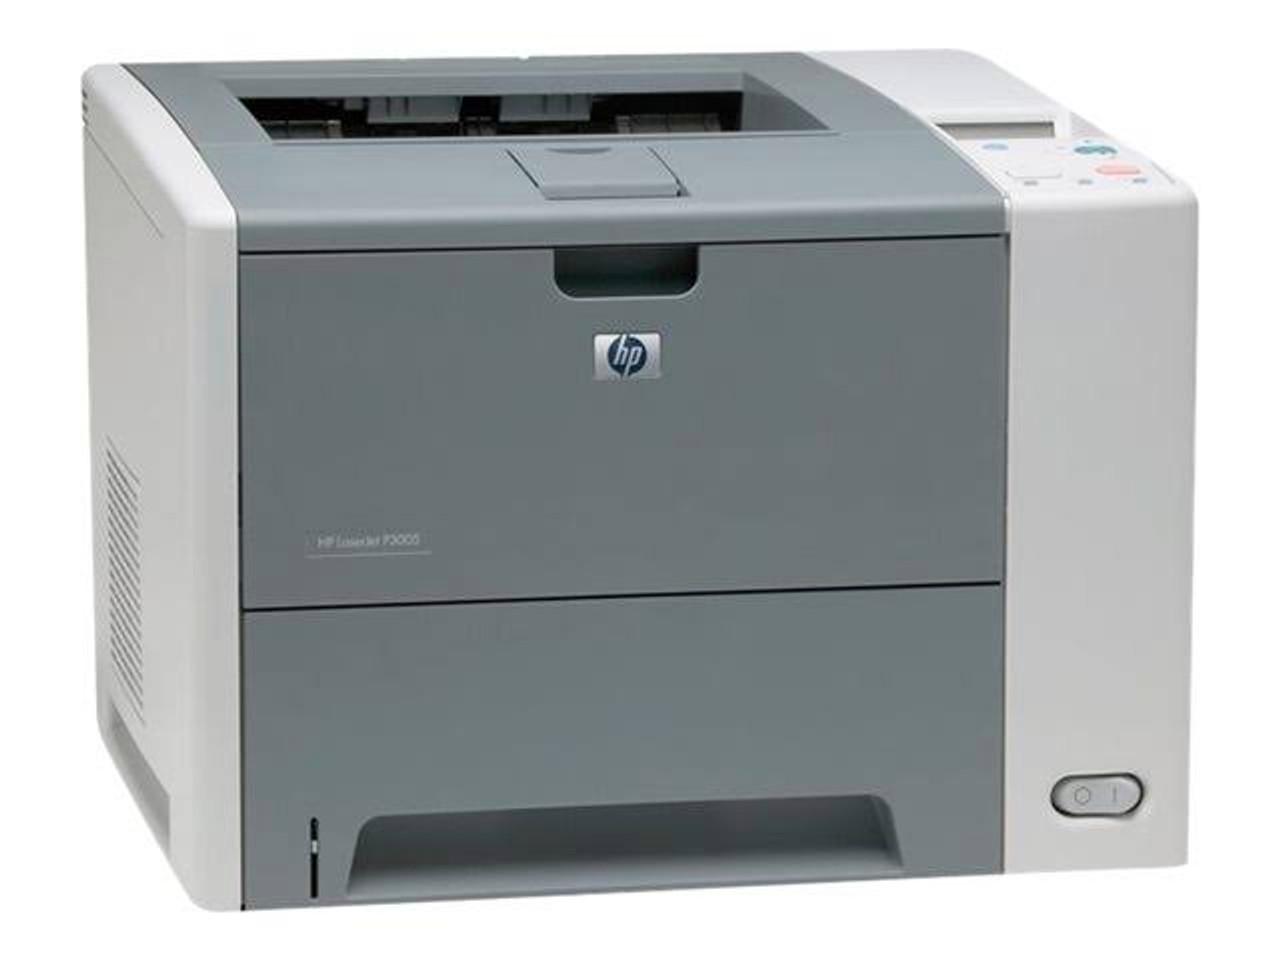 HP LaserJet P3005 - 35 ppm - 600 sheets